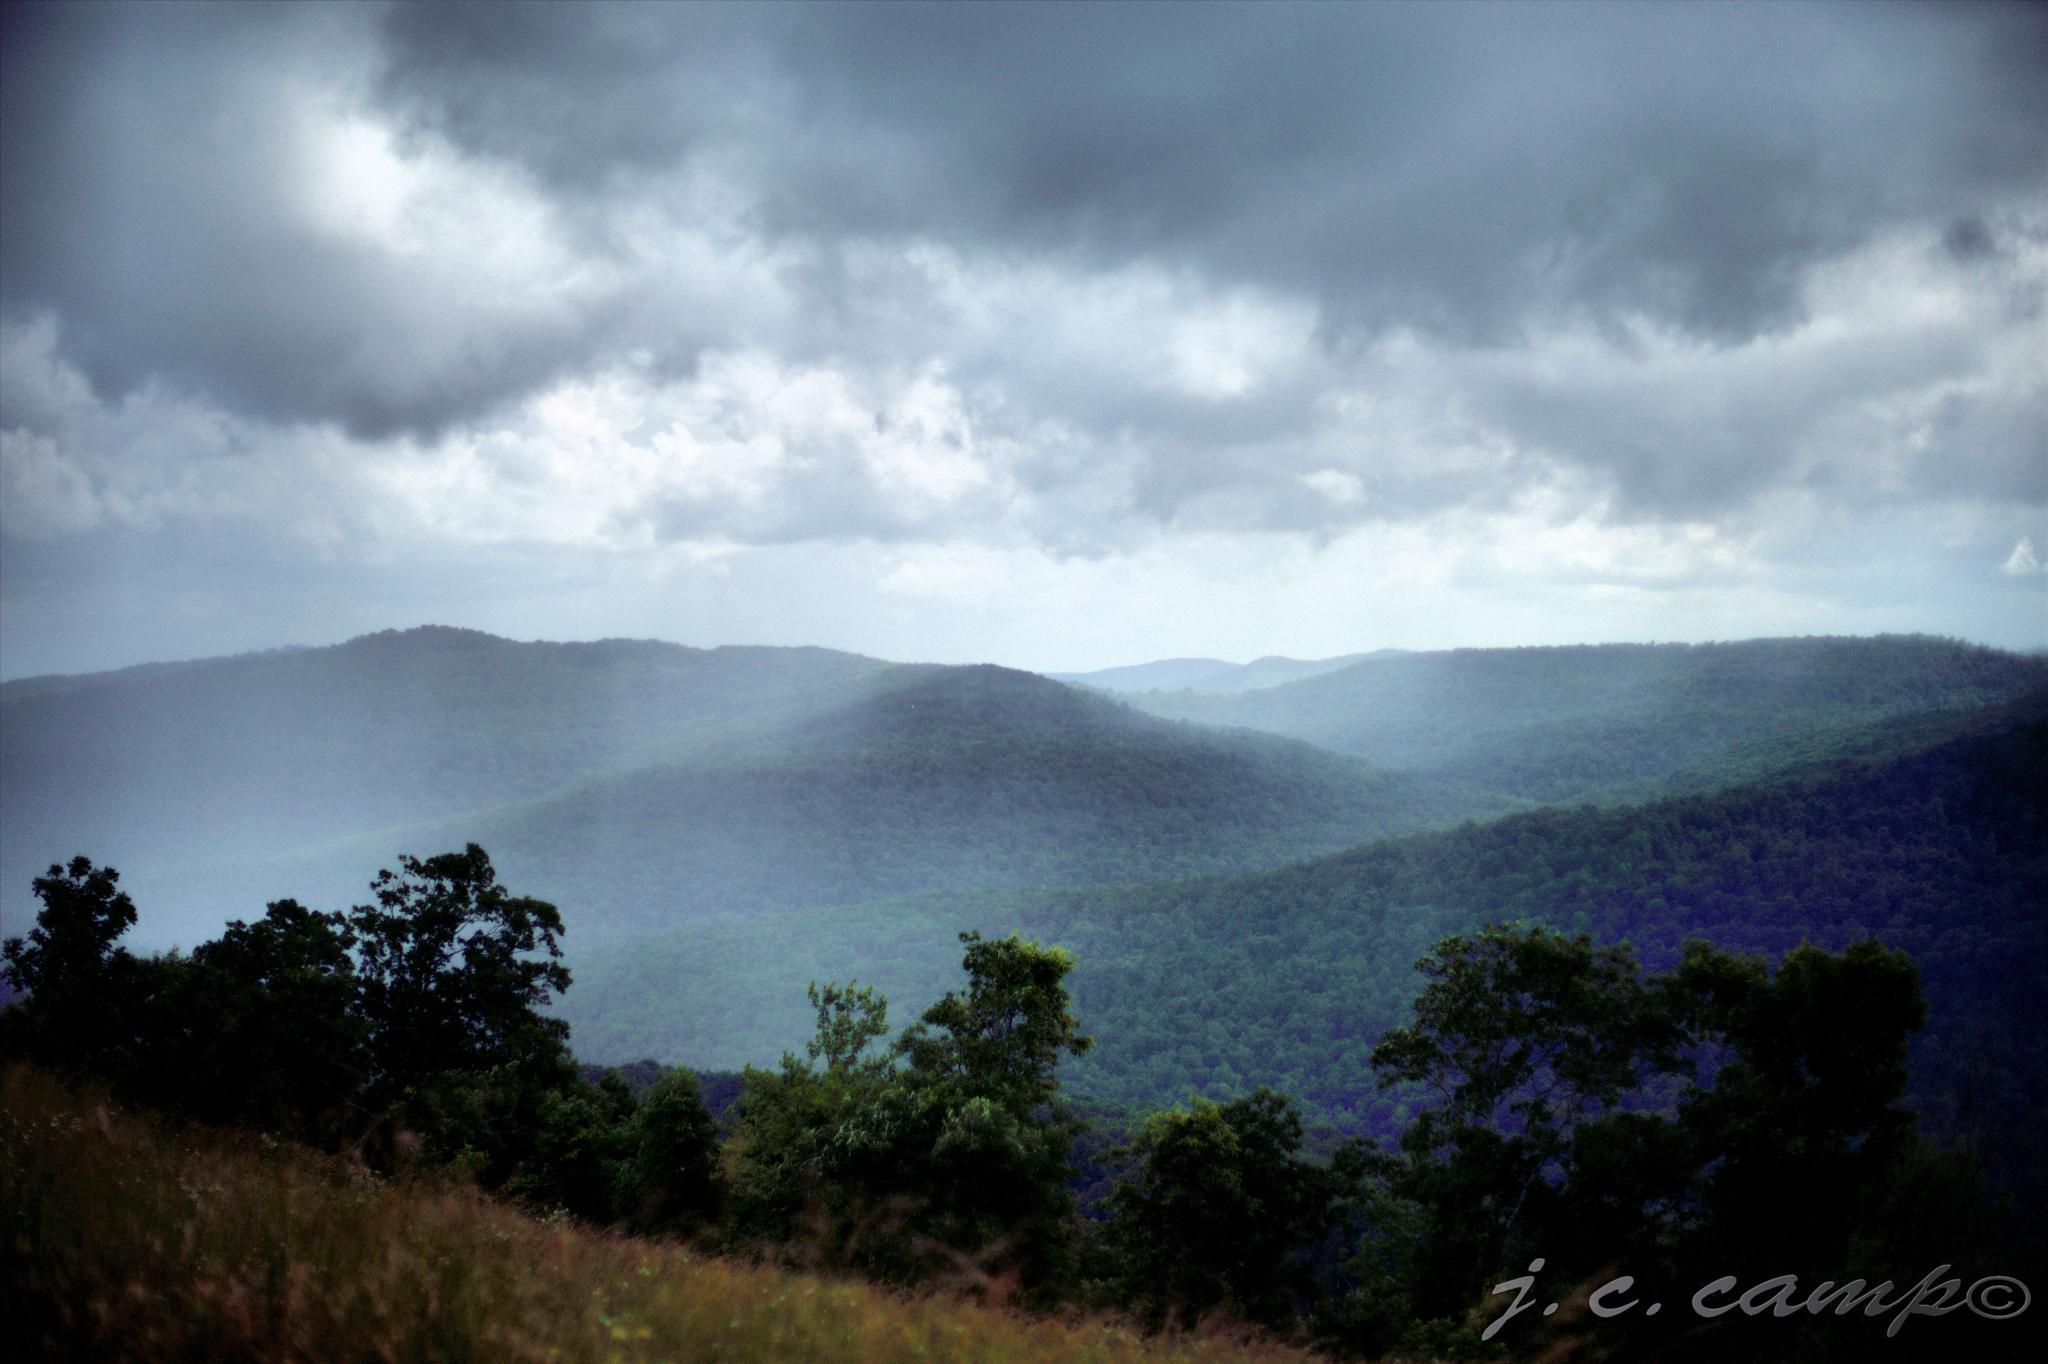 More Rain by Jim Camp